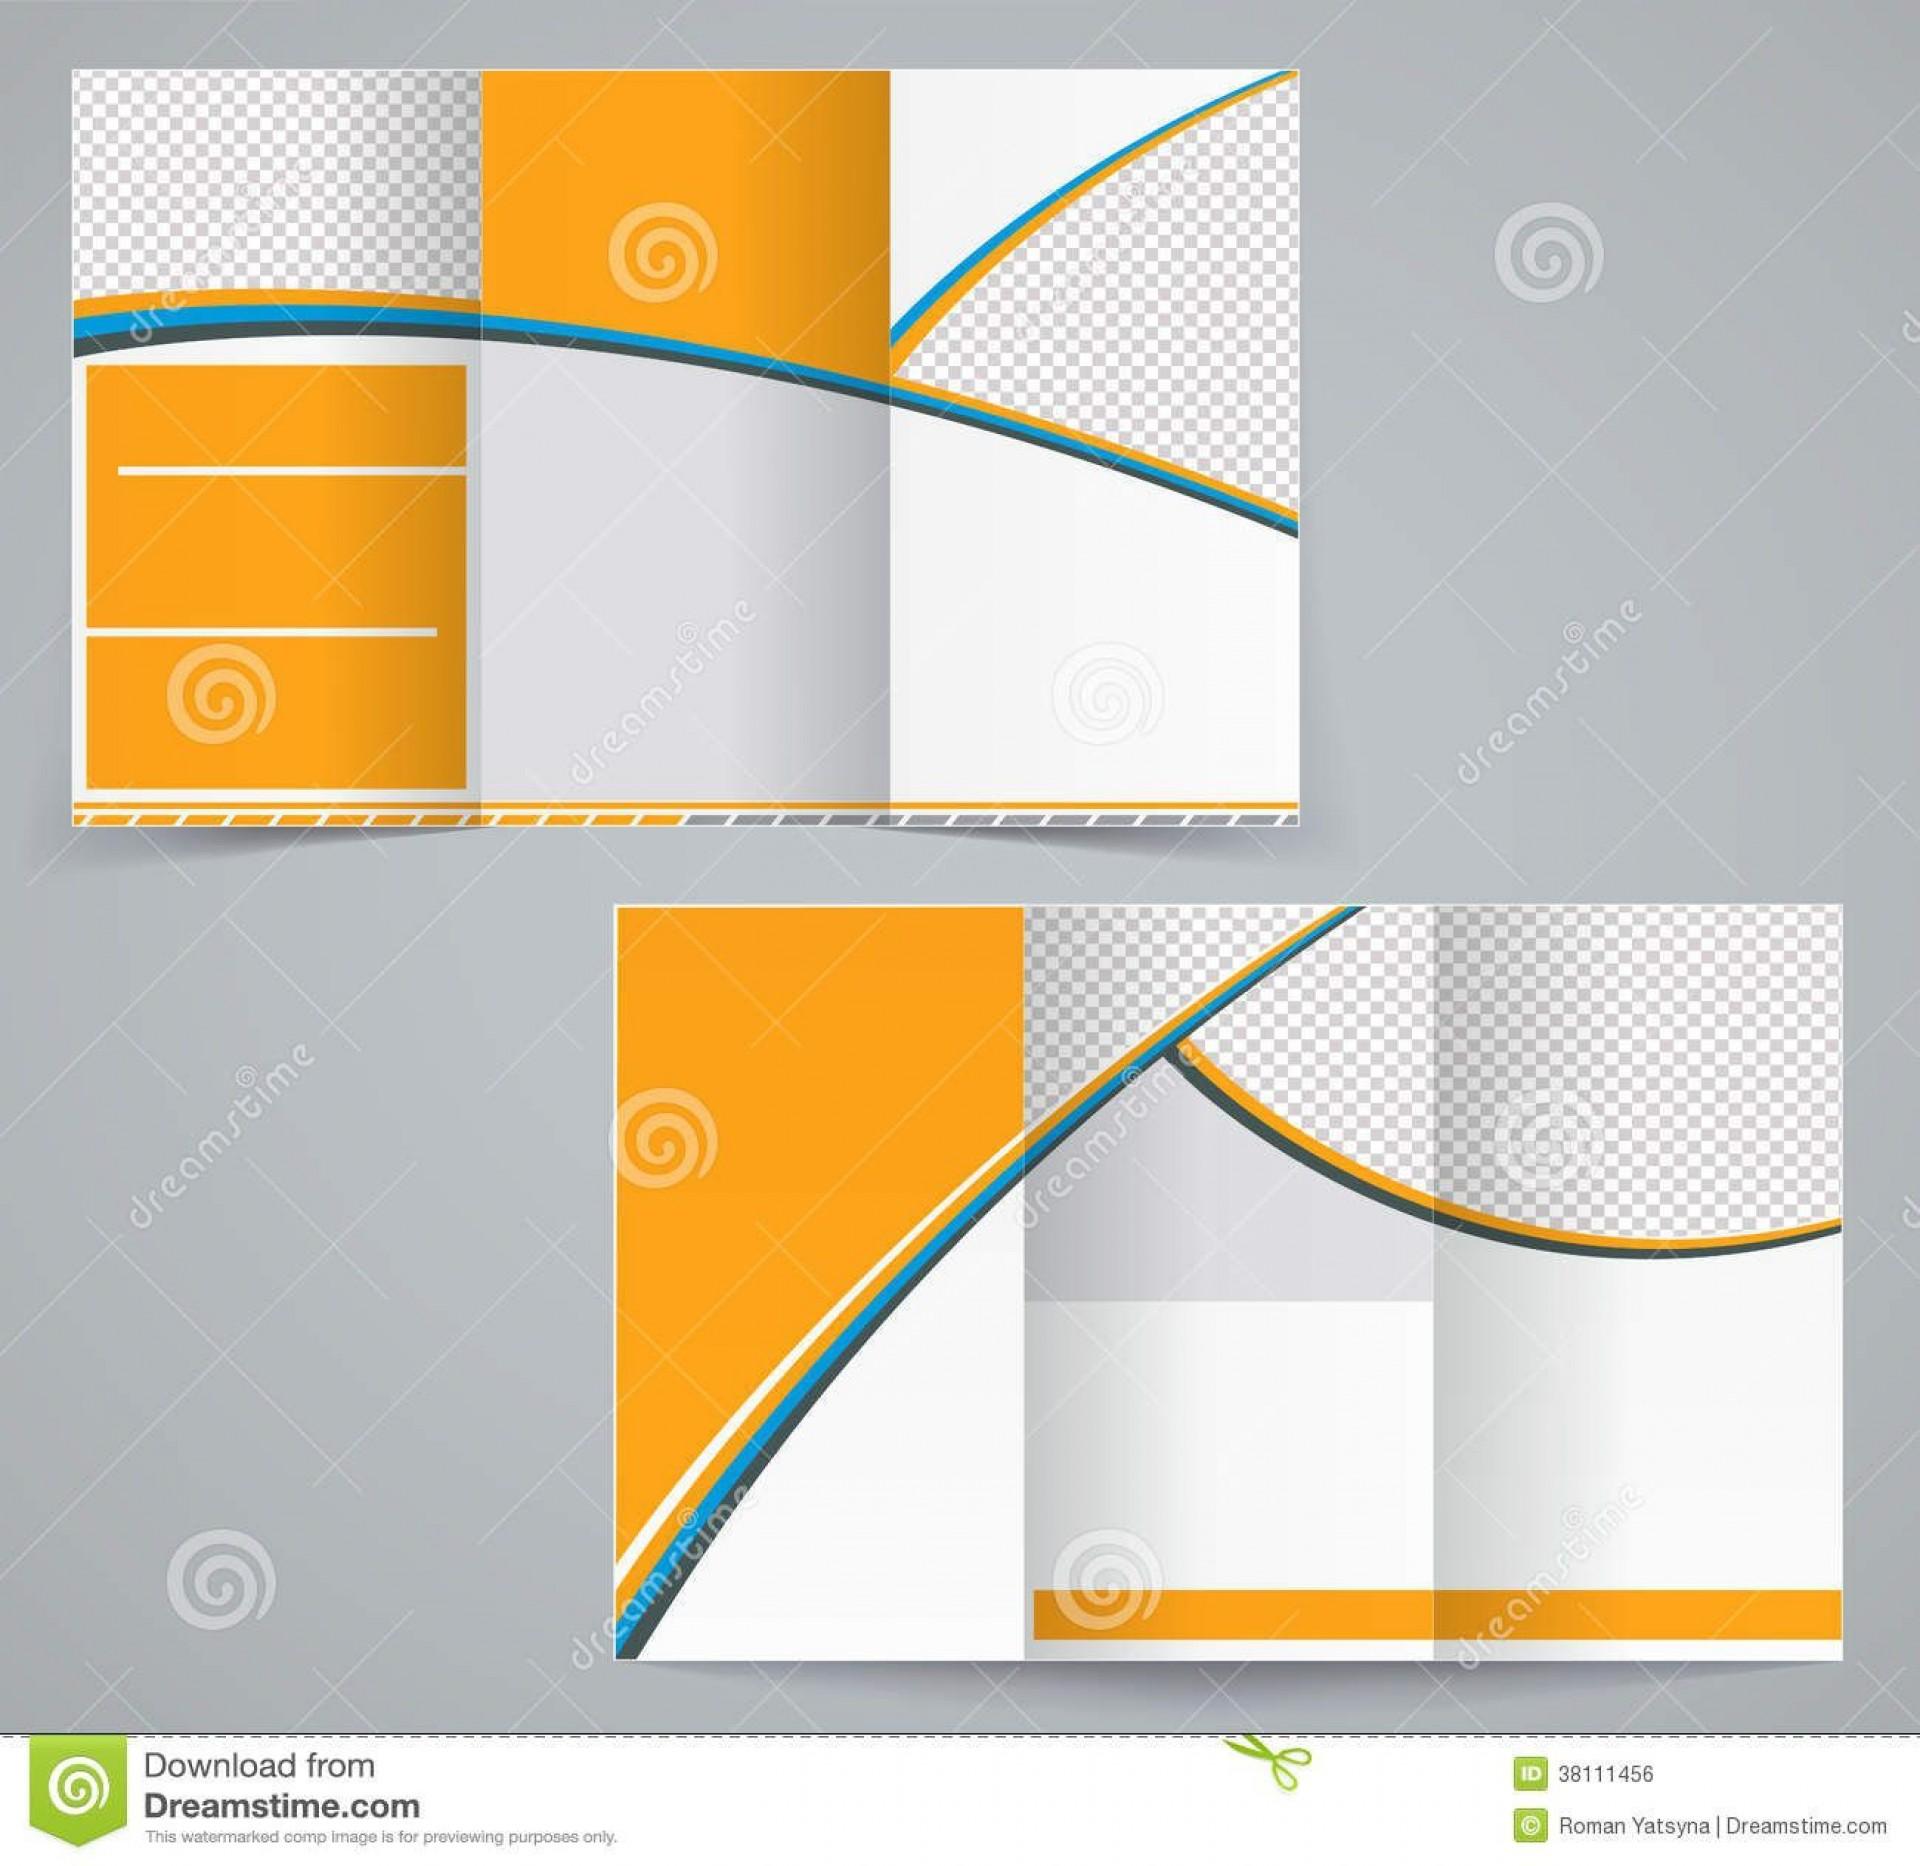 009 Stirring Tri Fold Brochure Template Free High Def  Download Photoshop M Word Tri-fold Indesign Mac1920